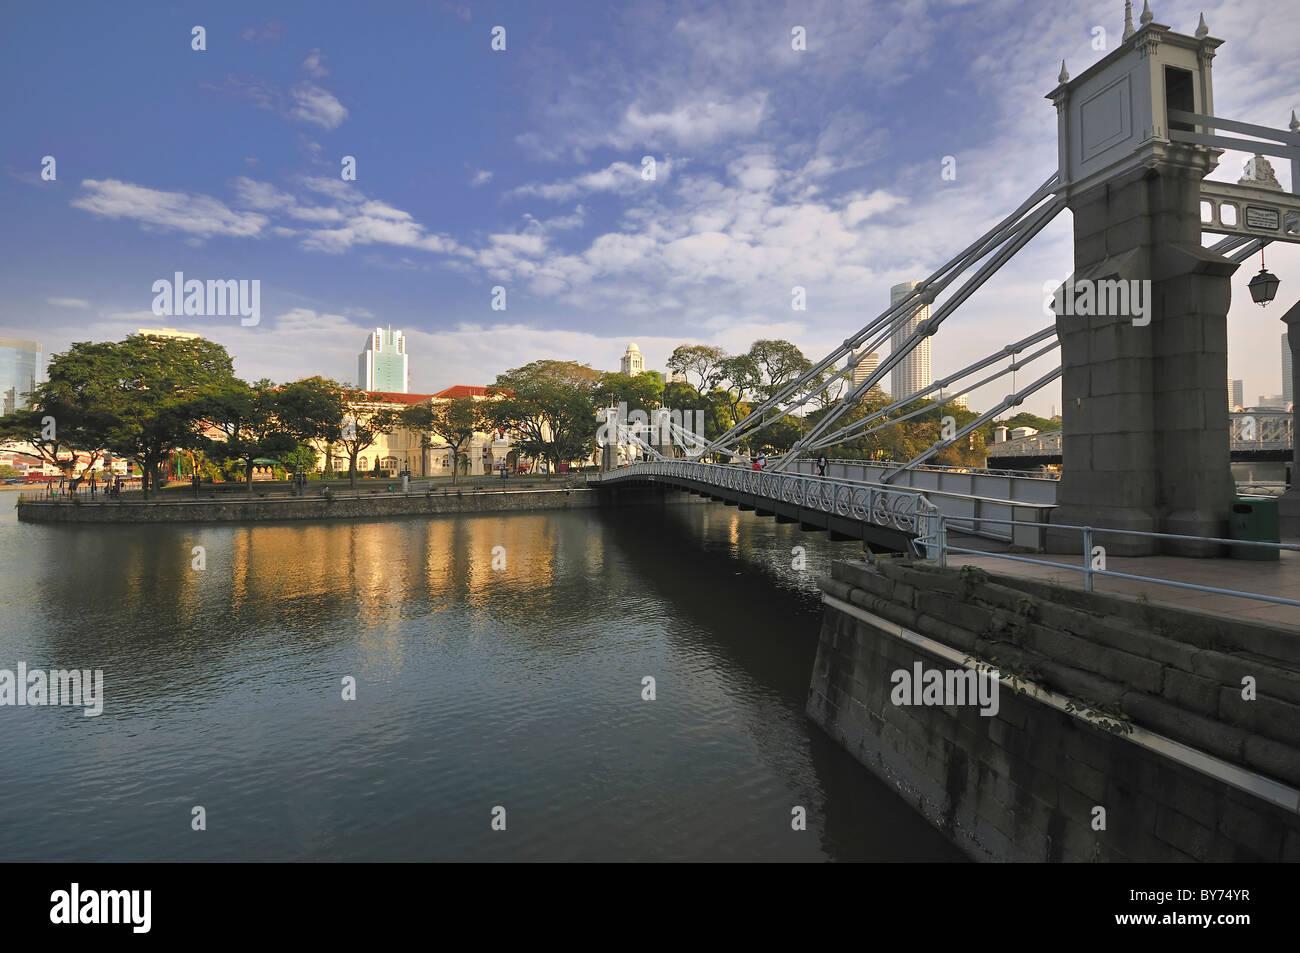 Cavenagh Bridge spanning the Singapore River. - Stock Image